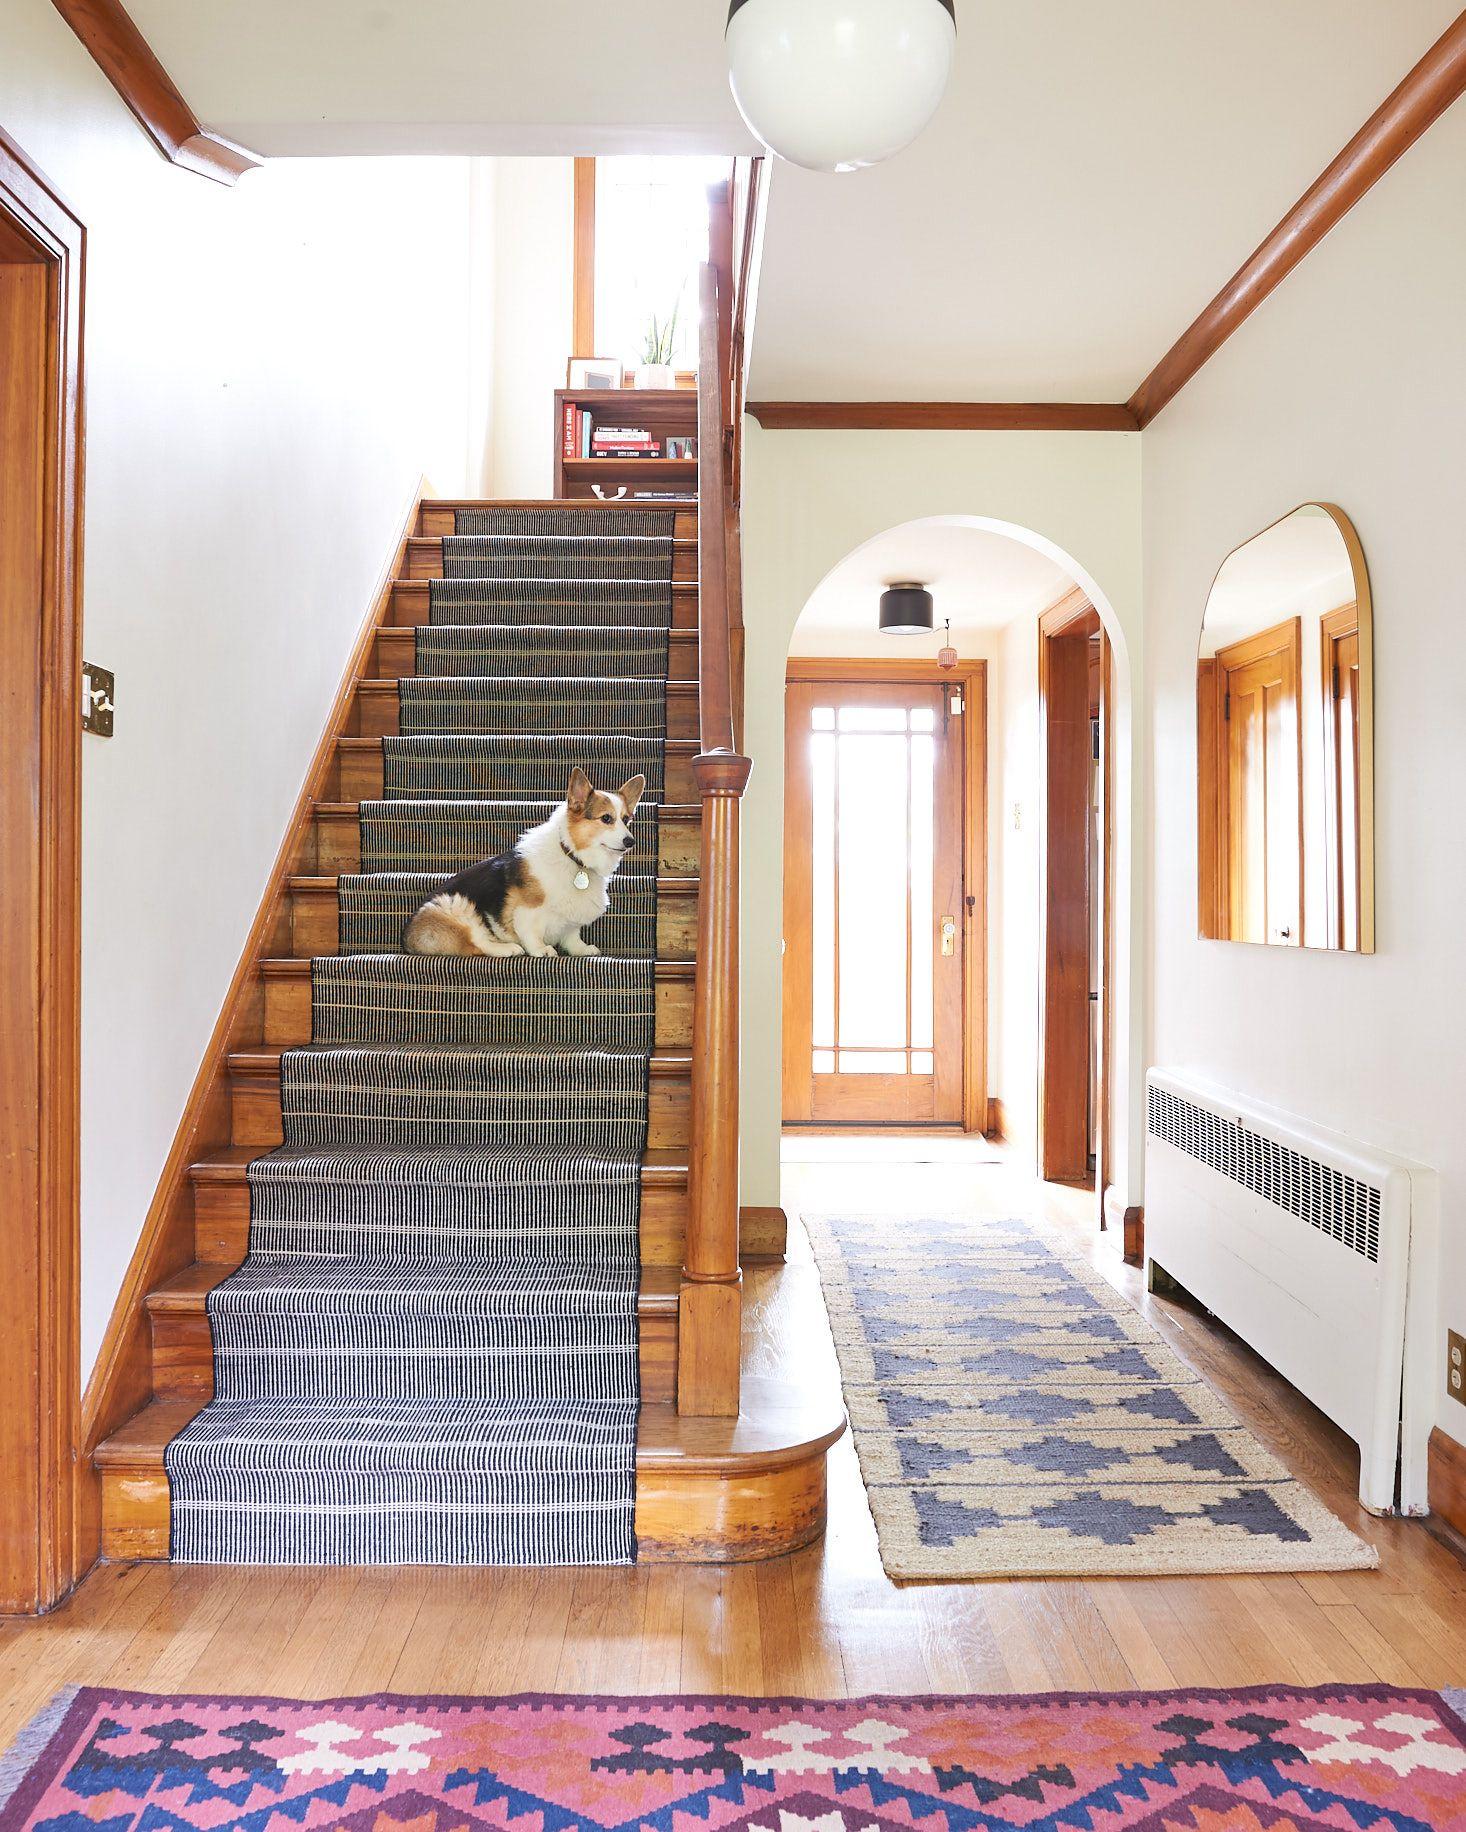 DIY Stair Runner Install Stairs, Carpet installation